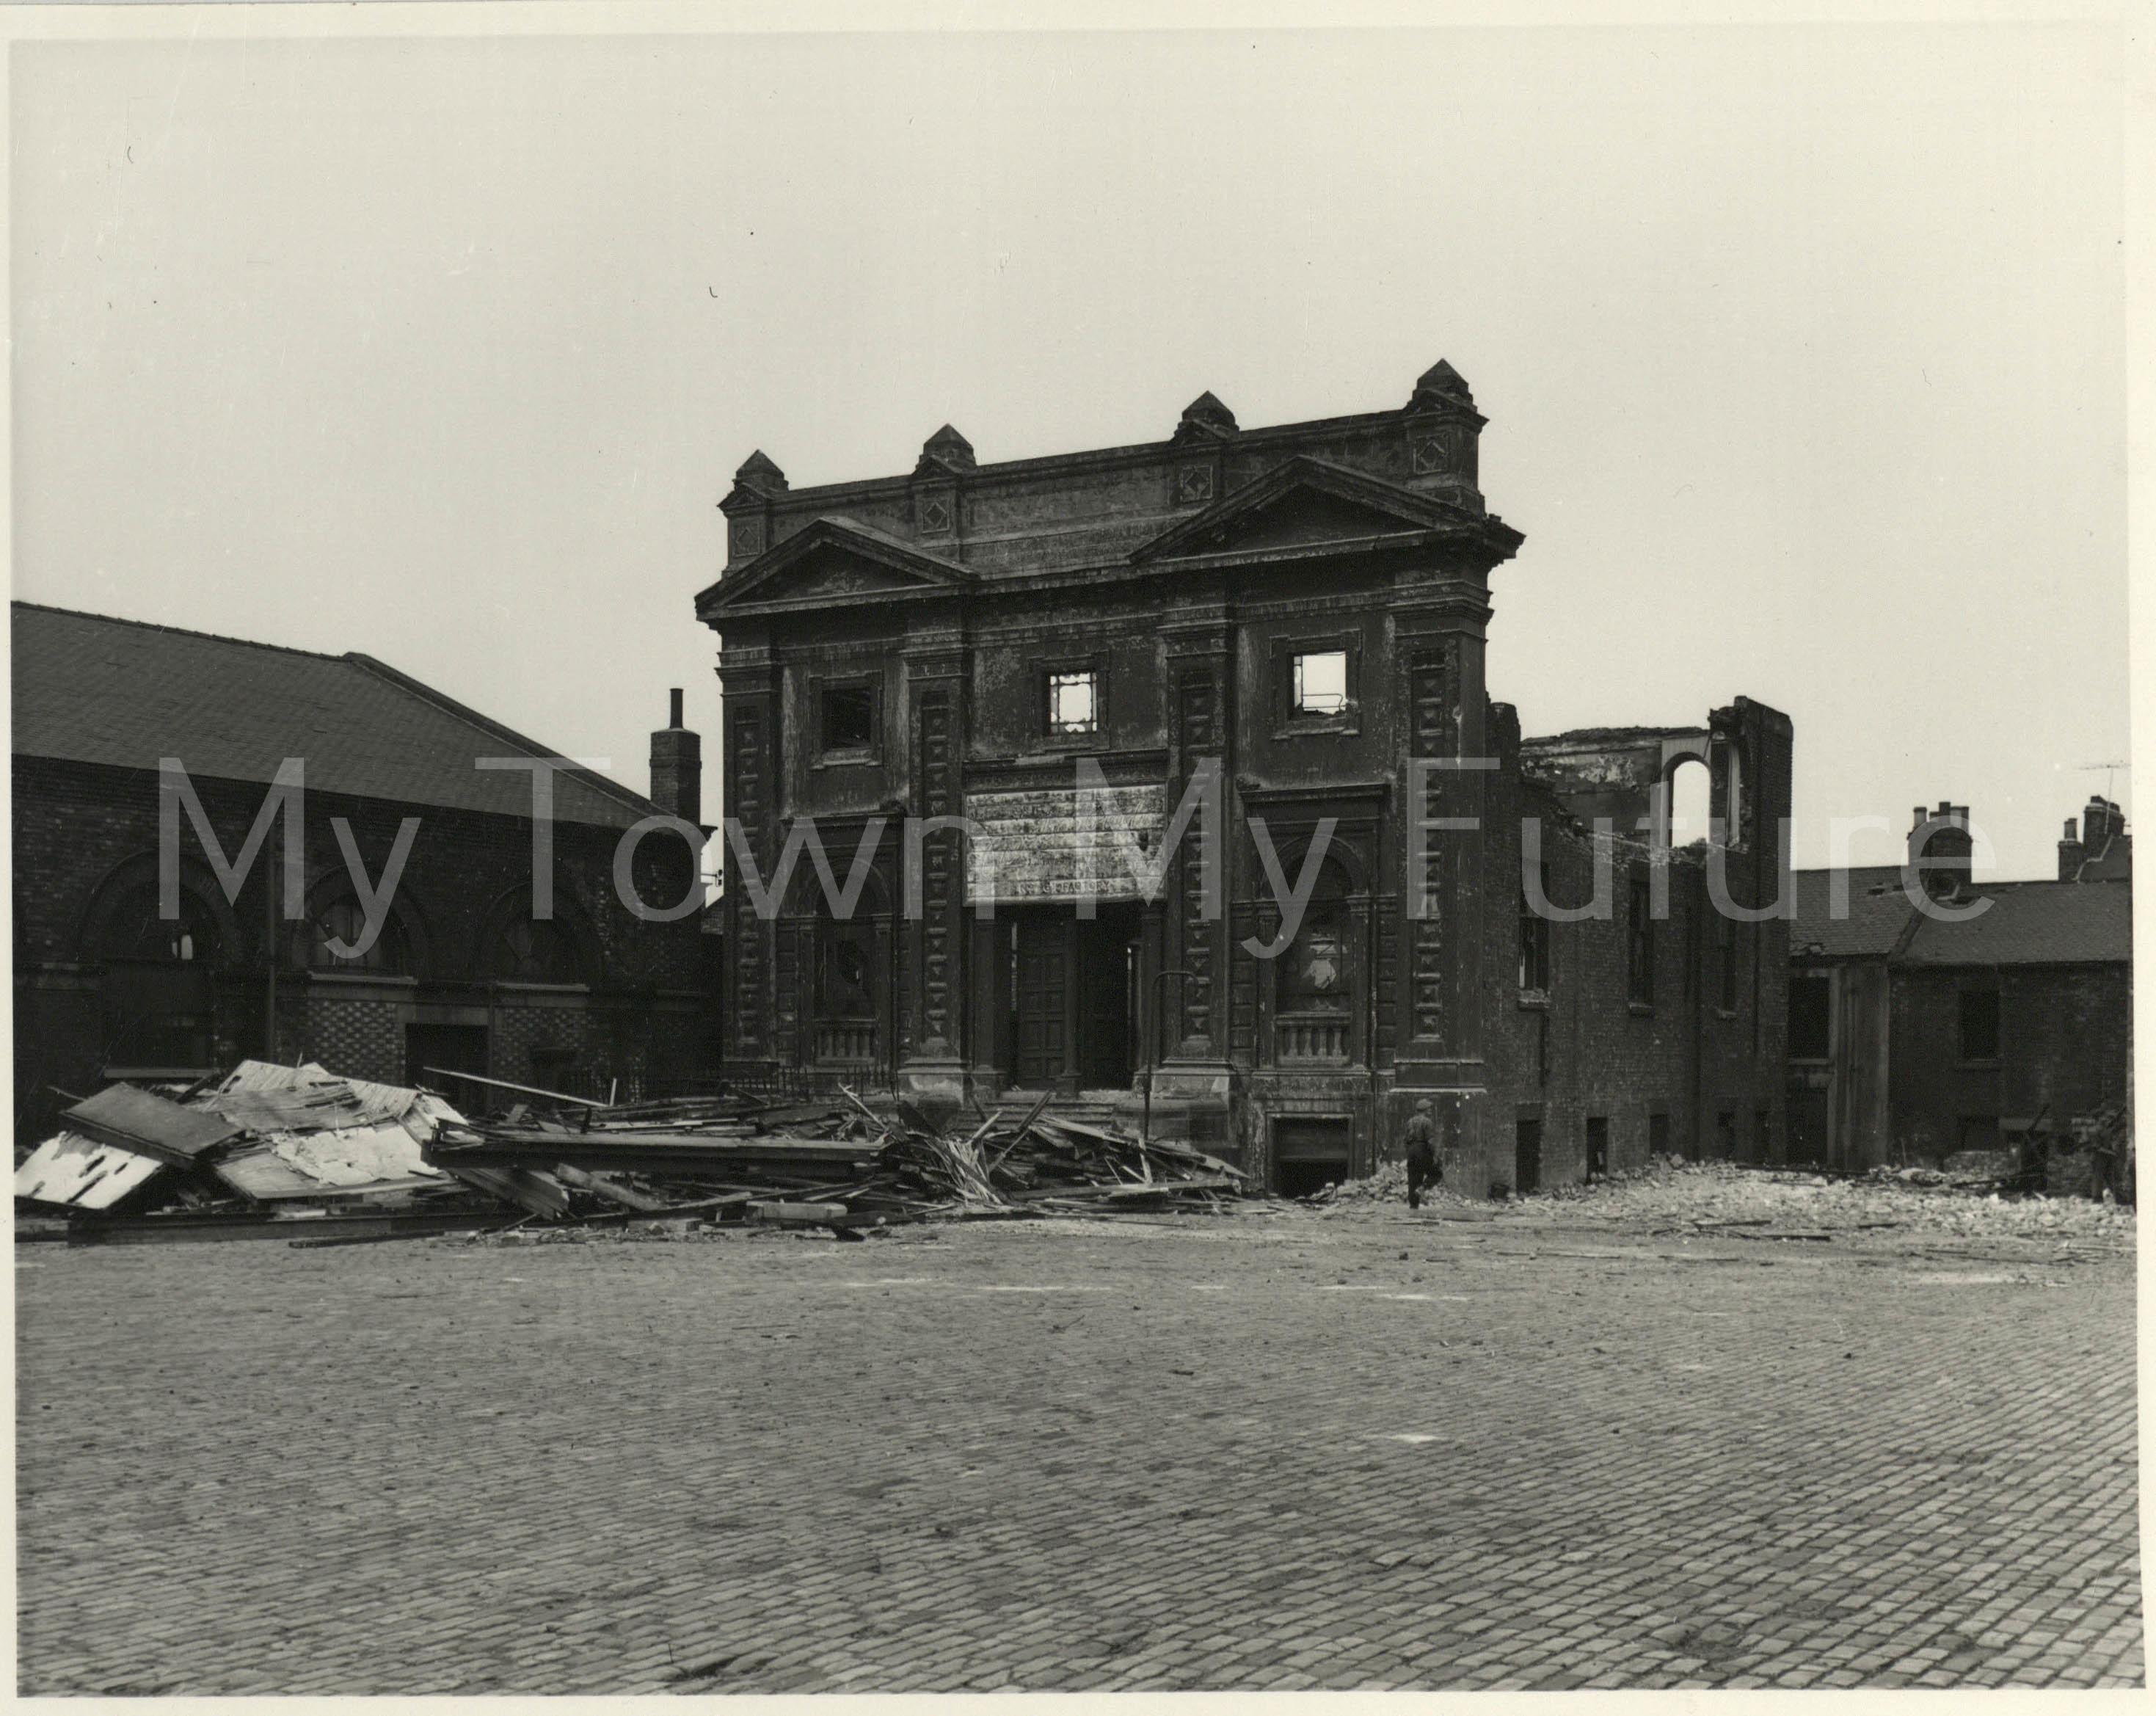 Centenary Methodist Church, 1959 - Department of Planning and Development - Teesside